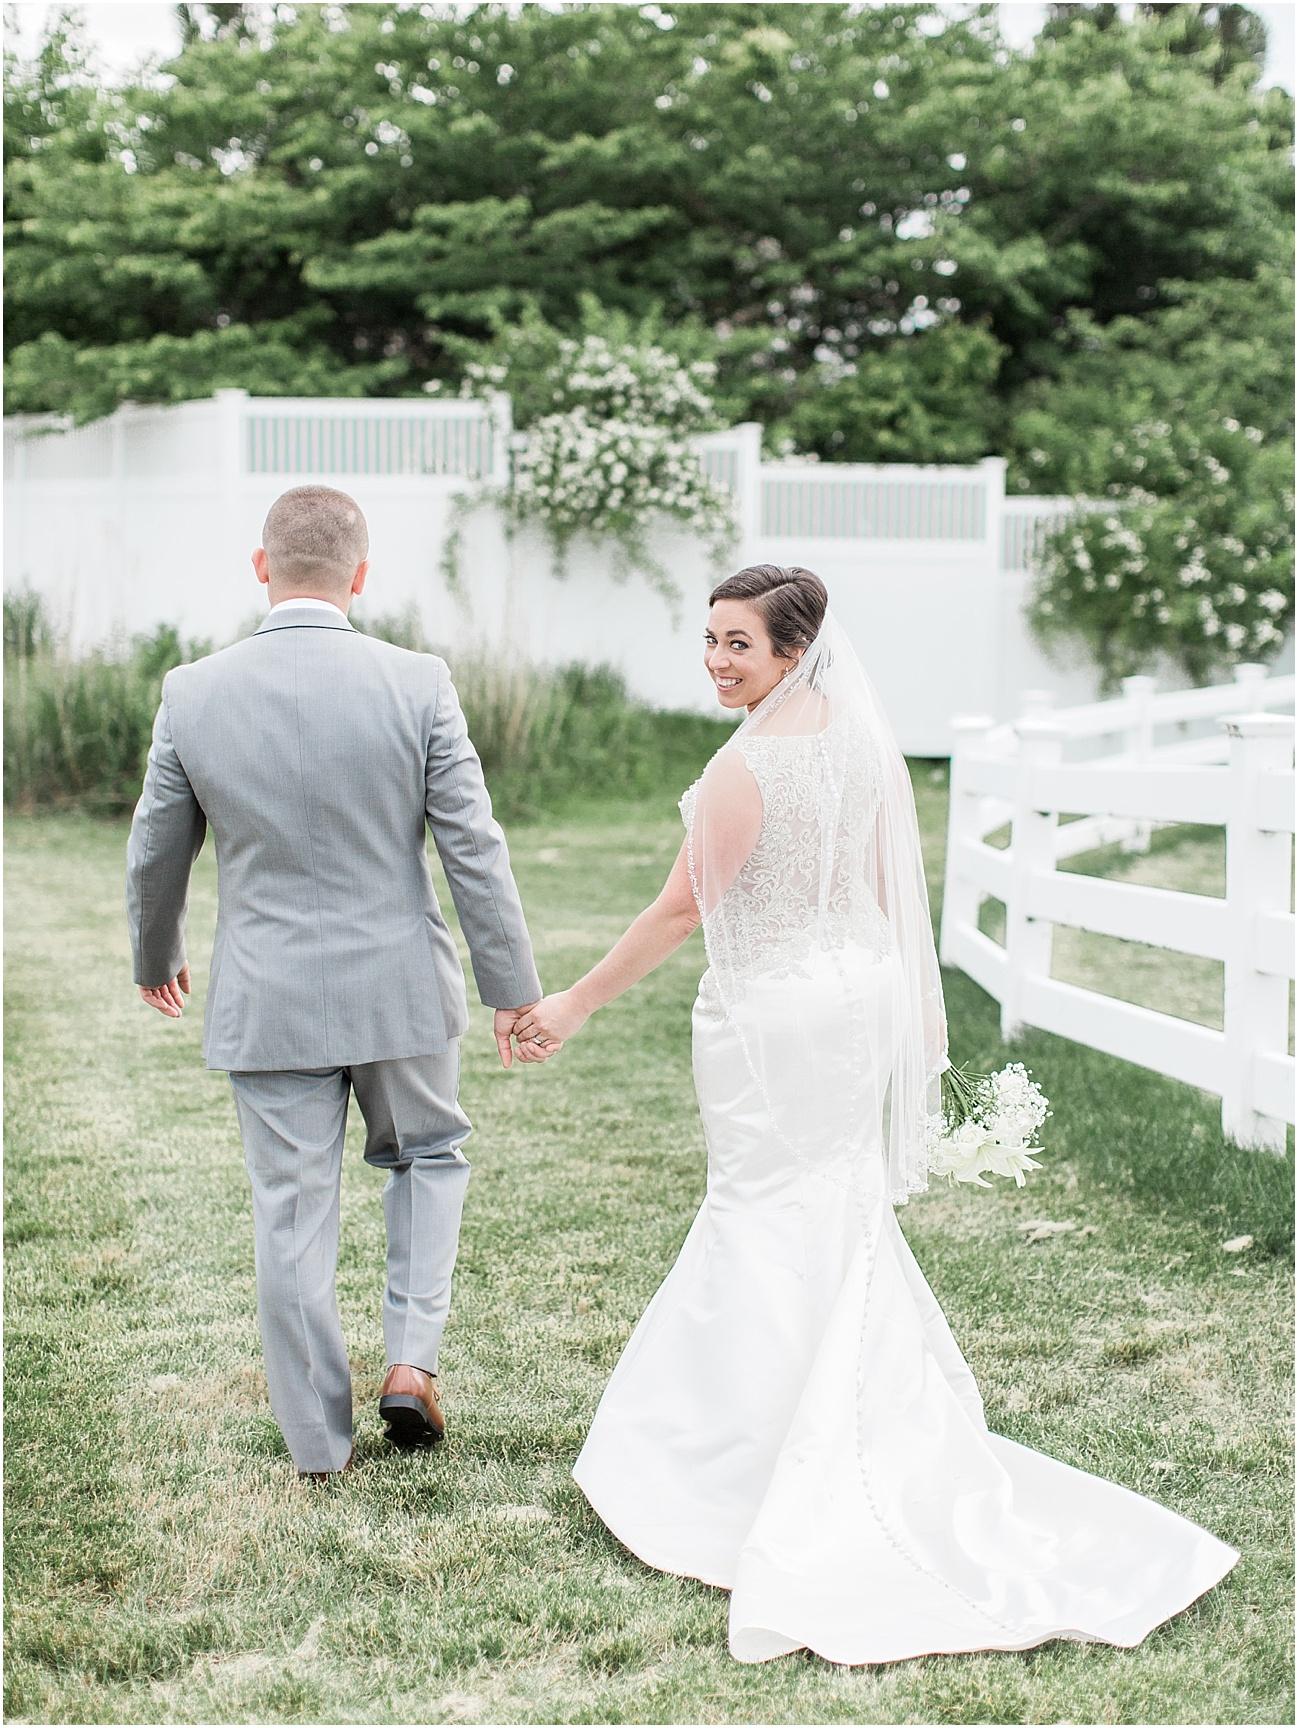 nicole_stephen_cape_club_nicky_falmouth_cod_boston_wedding_photographer_meredith_jane_photography_photo_0176.jpg